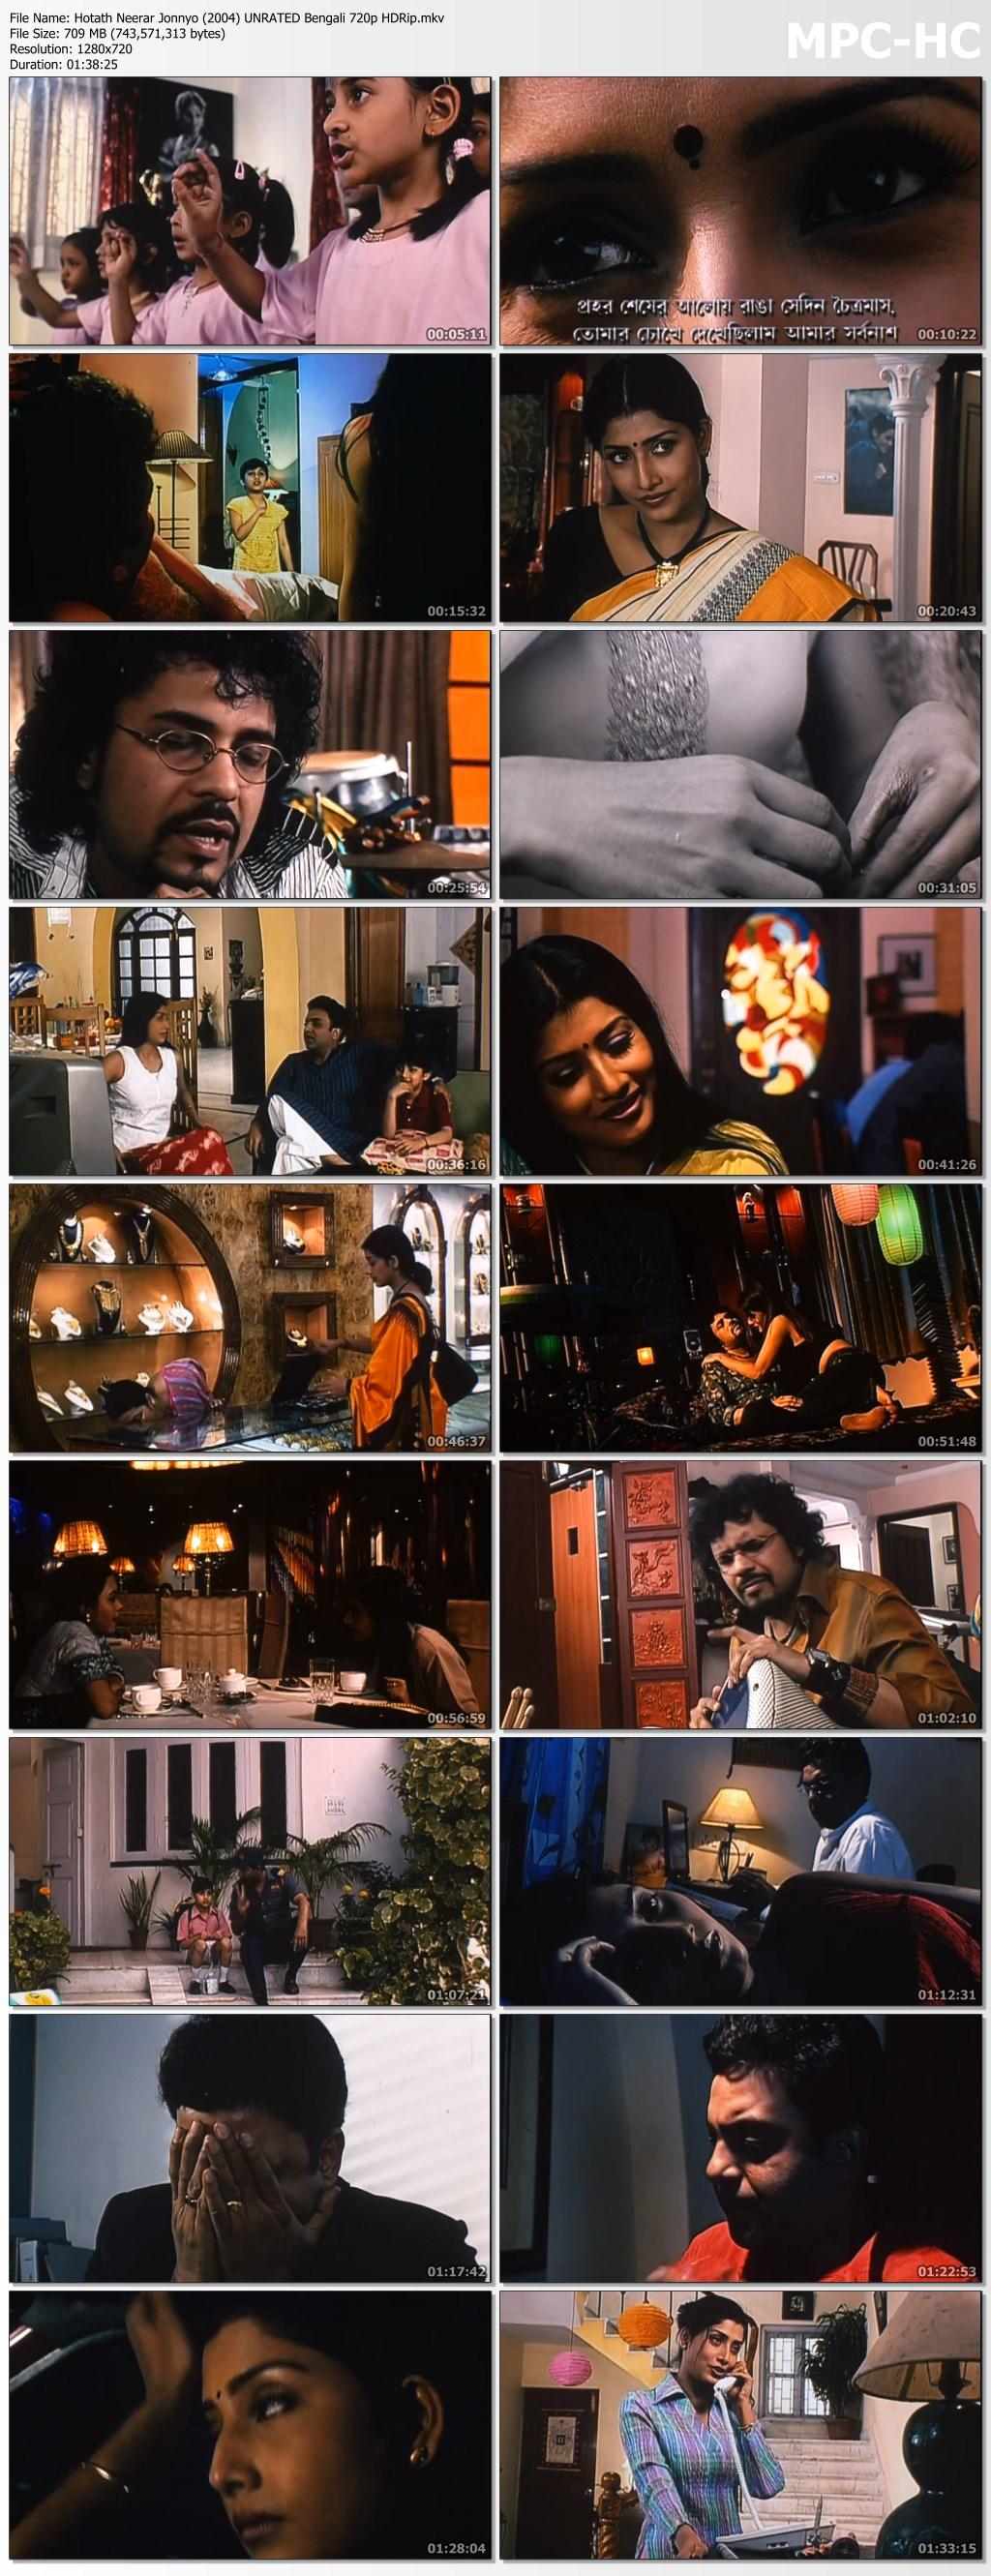 Hotath Neerar Jonnyo (2004) UNRATED Bengali 720p HDRip.mkv thumbs